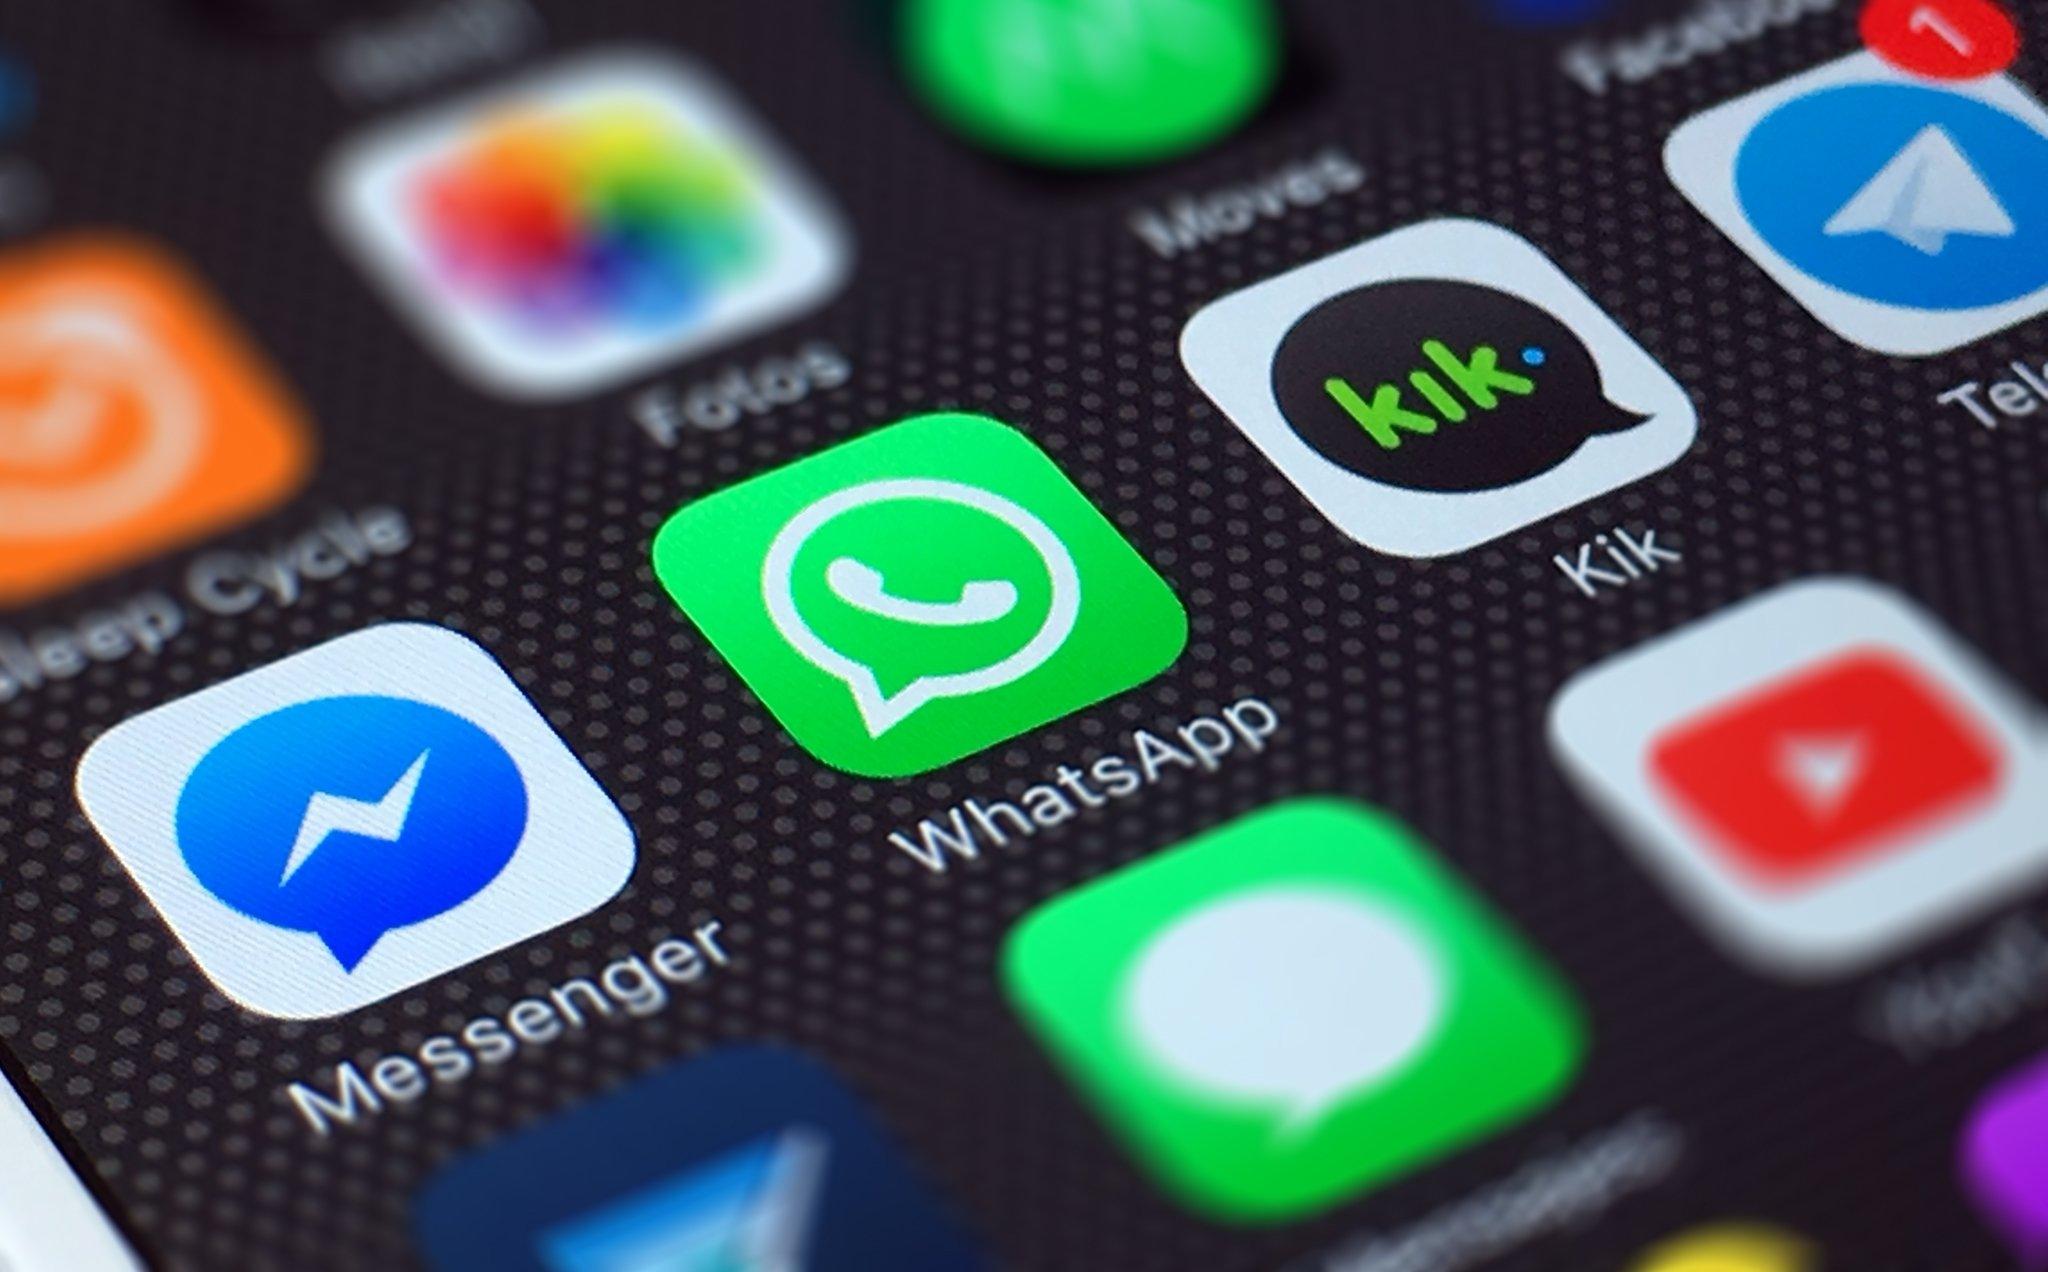 WhatsApp ícone no ecrã